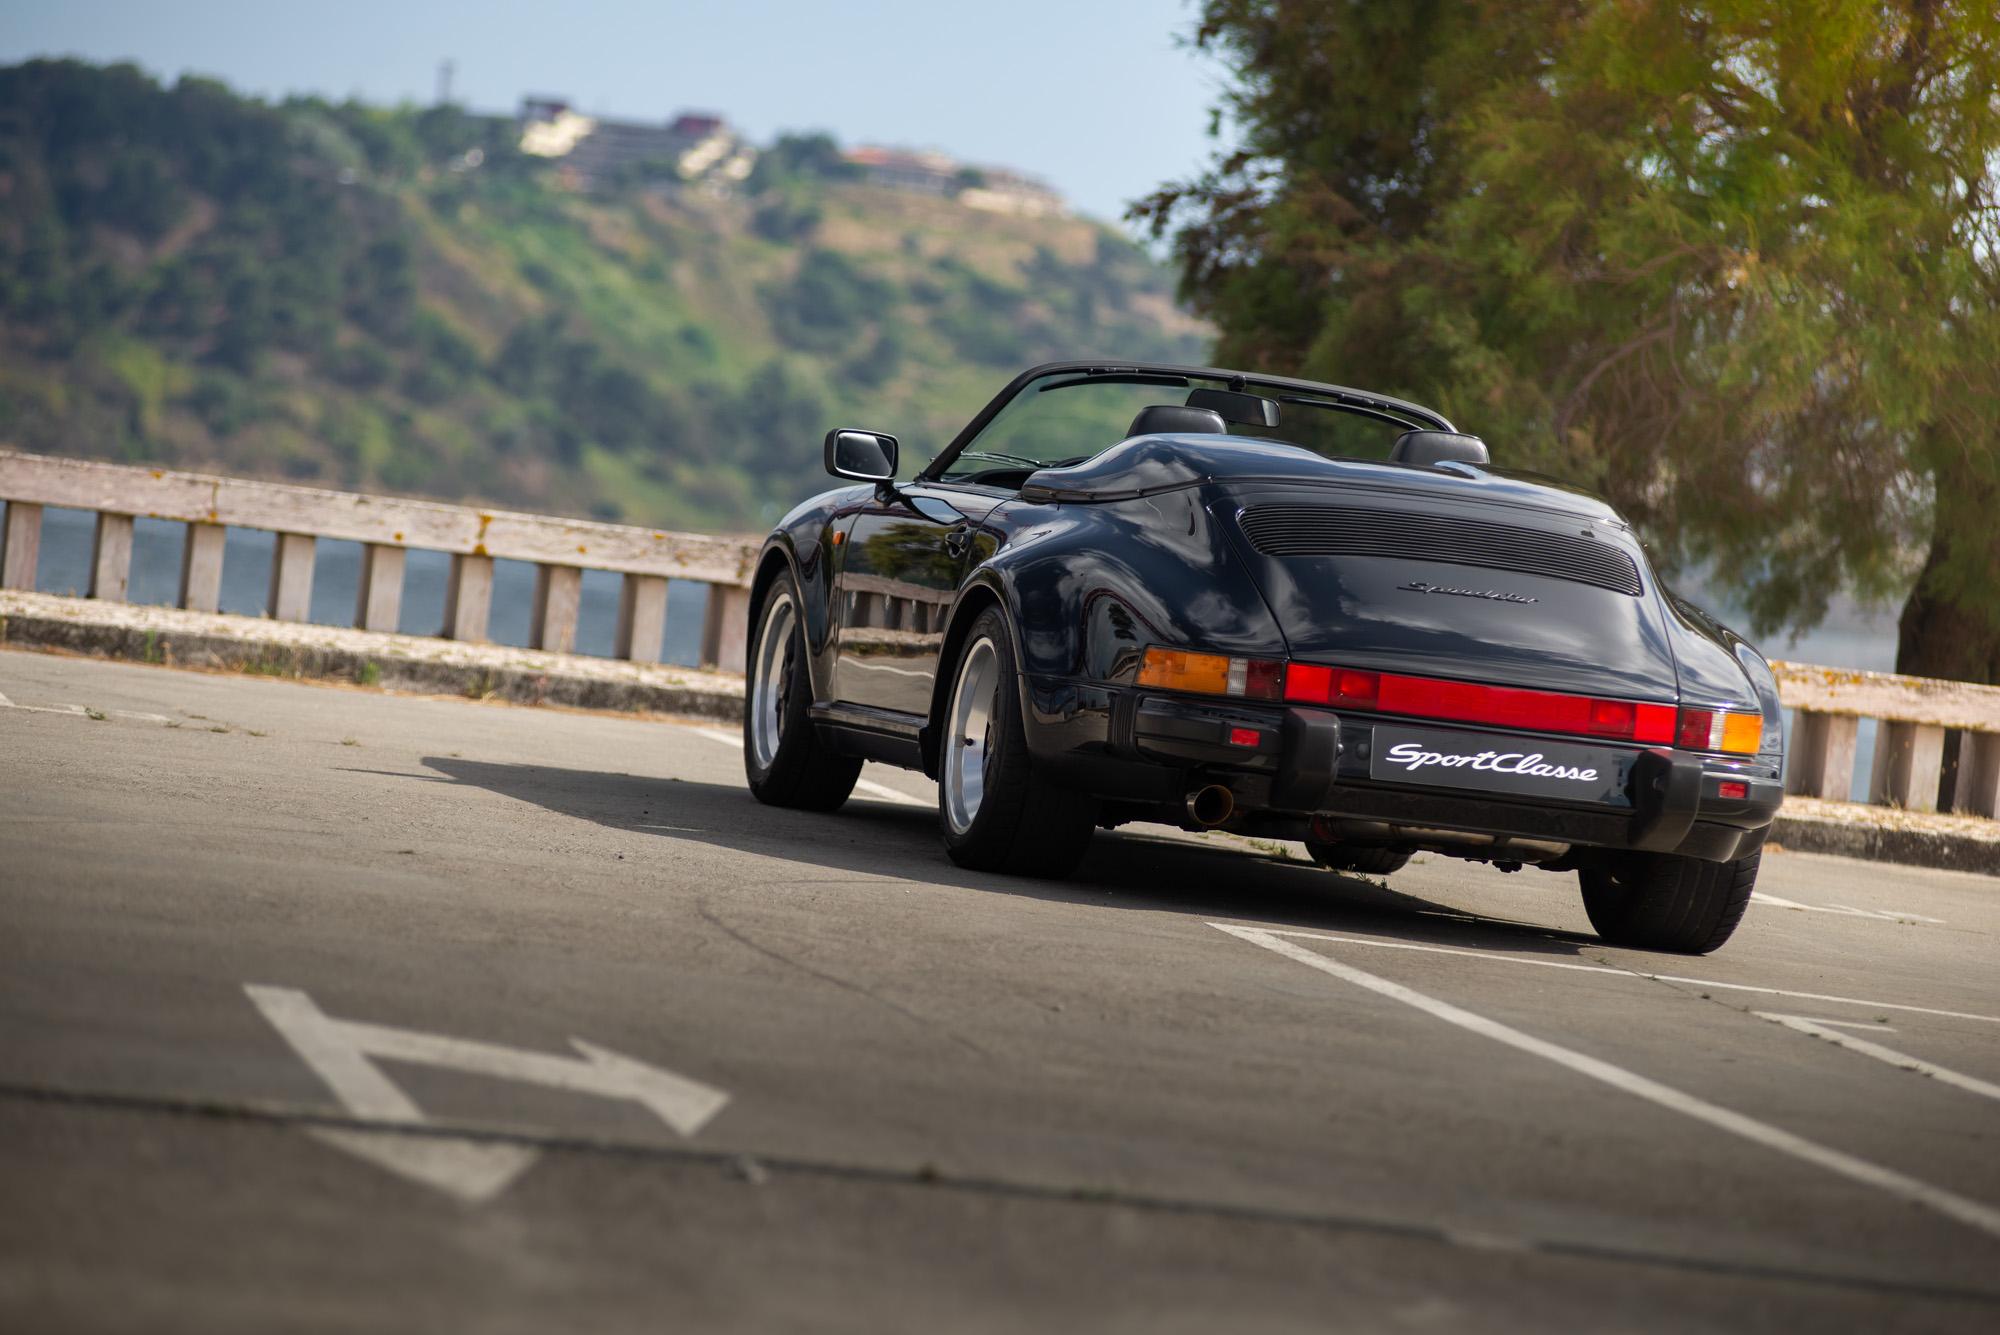 Porsche 911 Carrera 3.2 Speedster